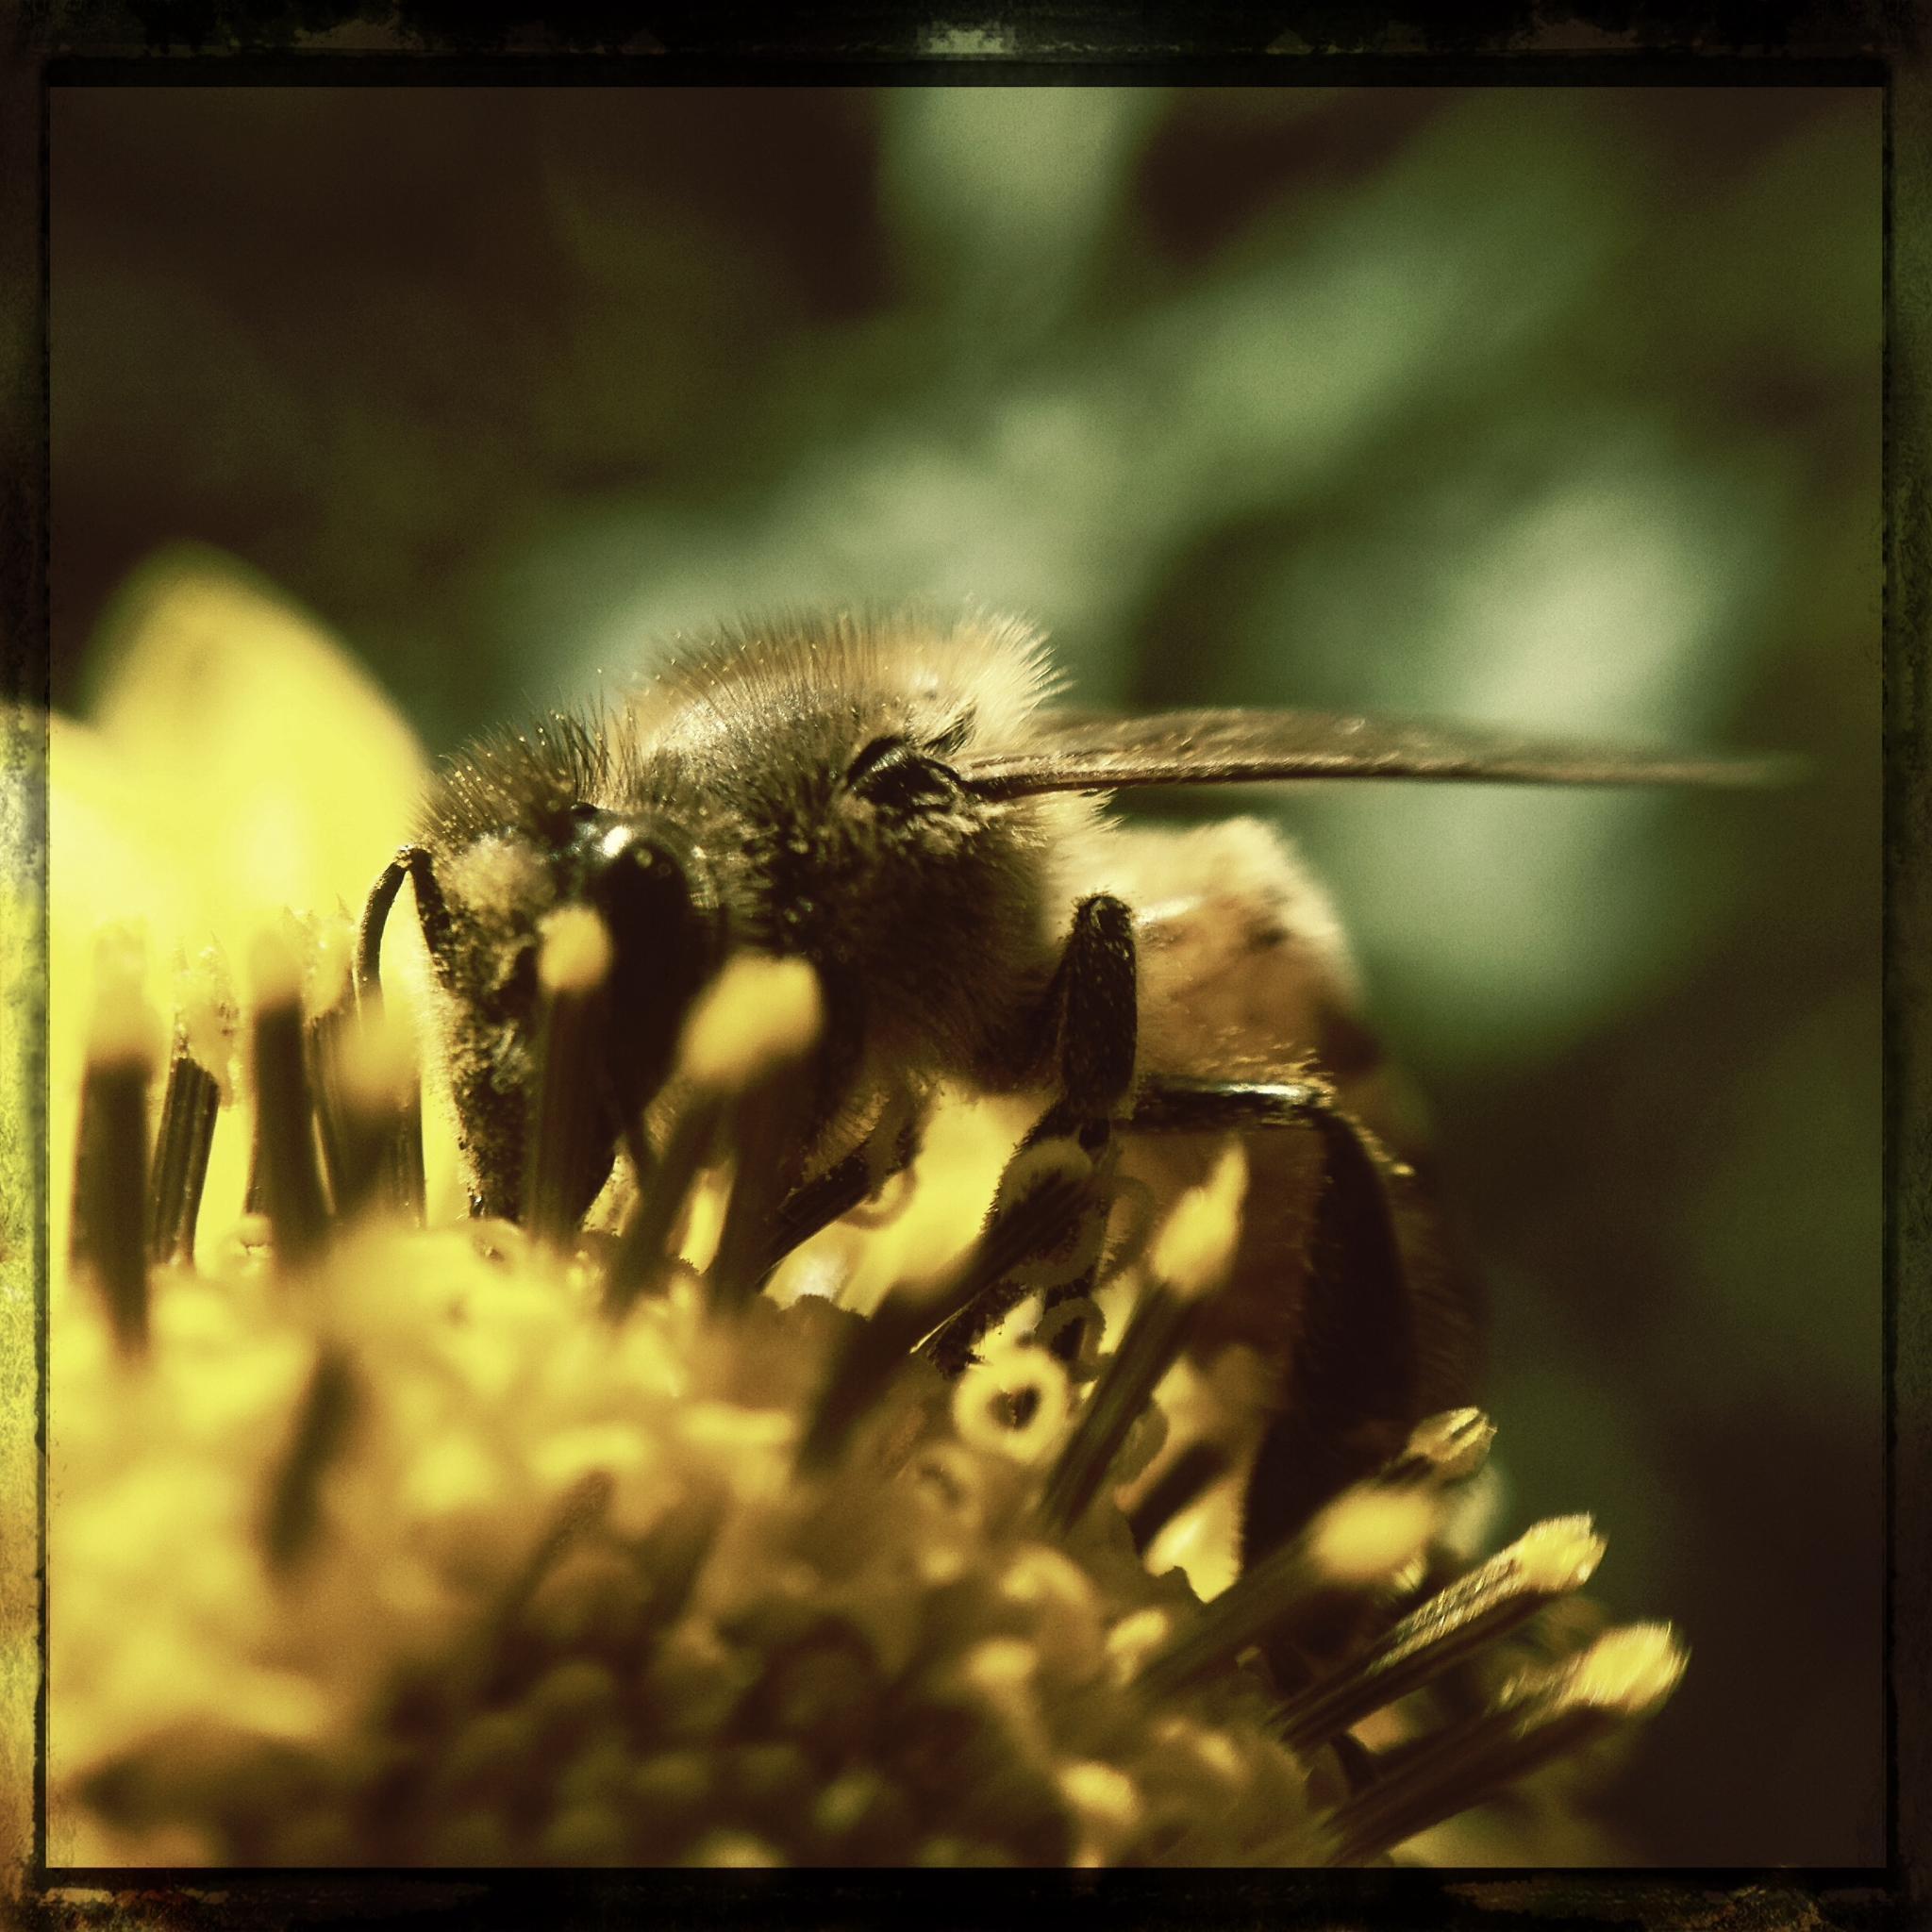 Hungrig Biene by BrianHusch